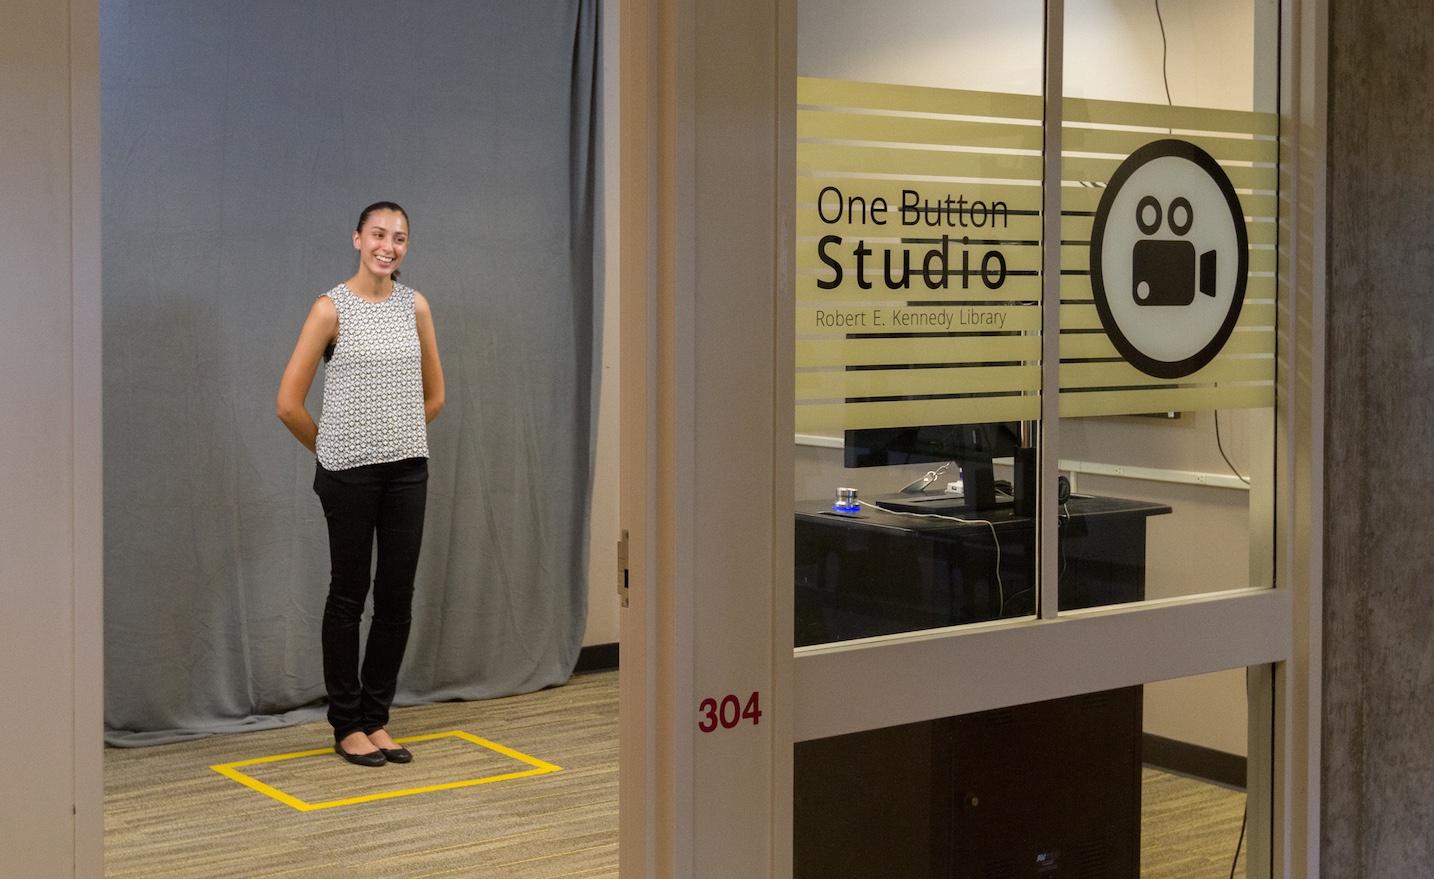 Recording video in the One Button Studio